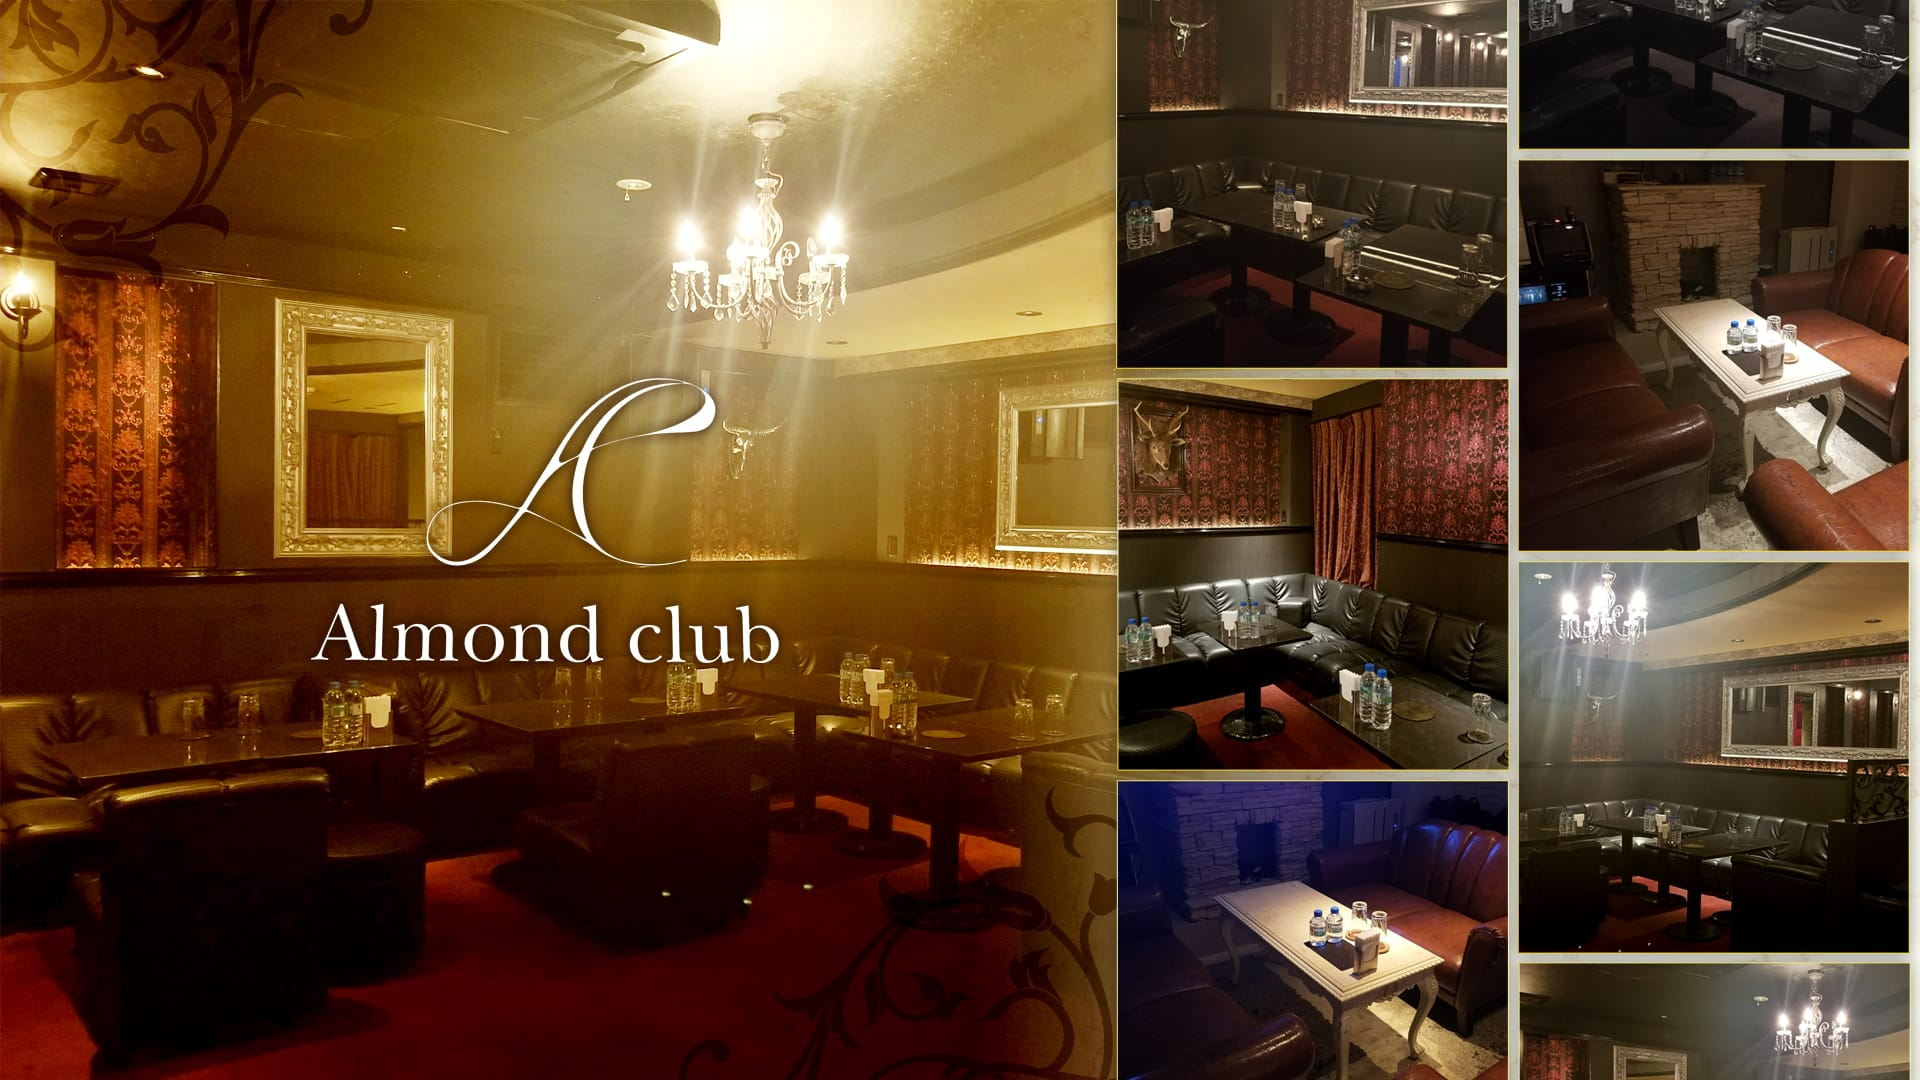 ALMONDCLUB~アマンドクラブ~ TOP画像